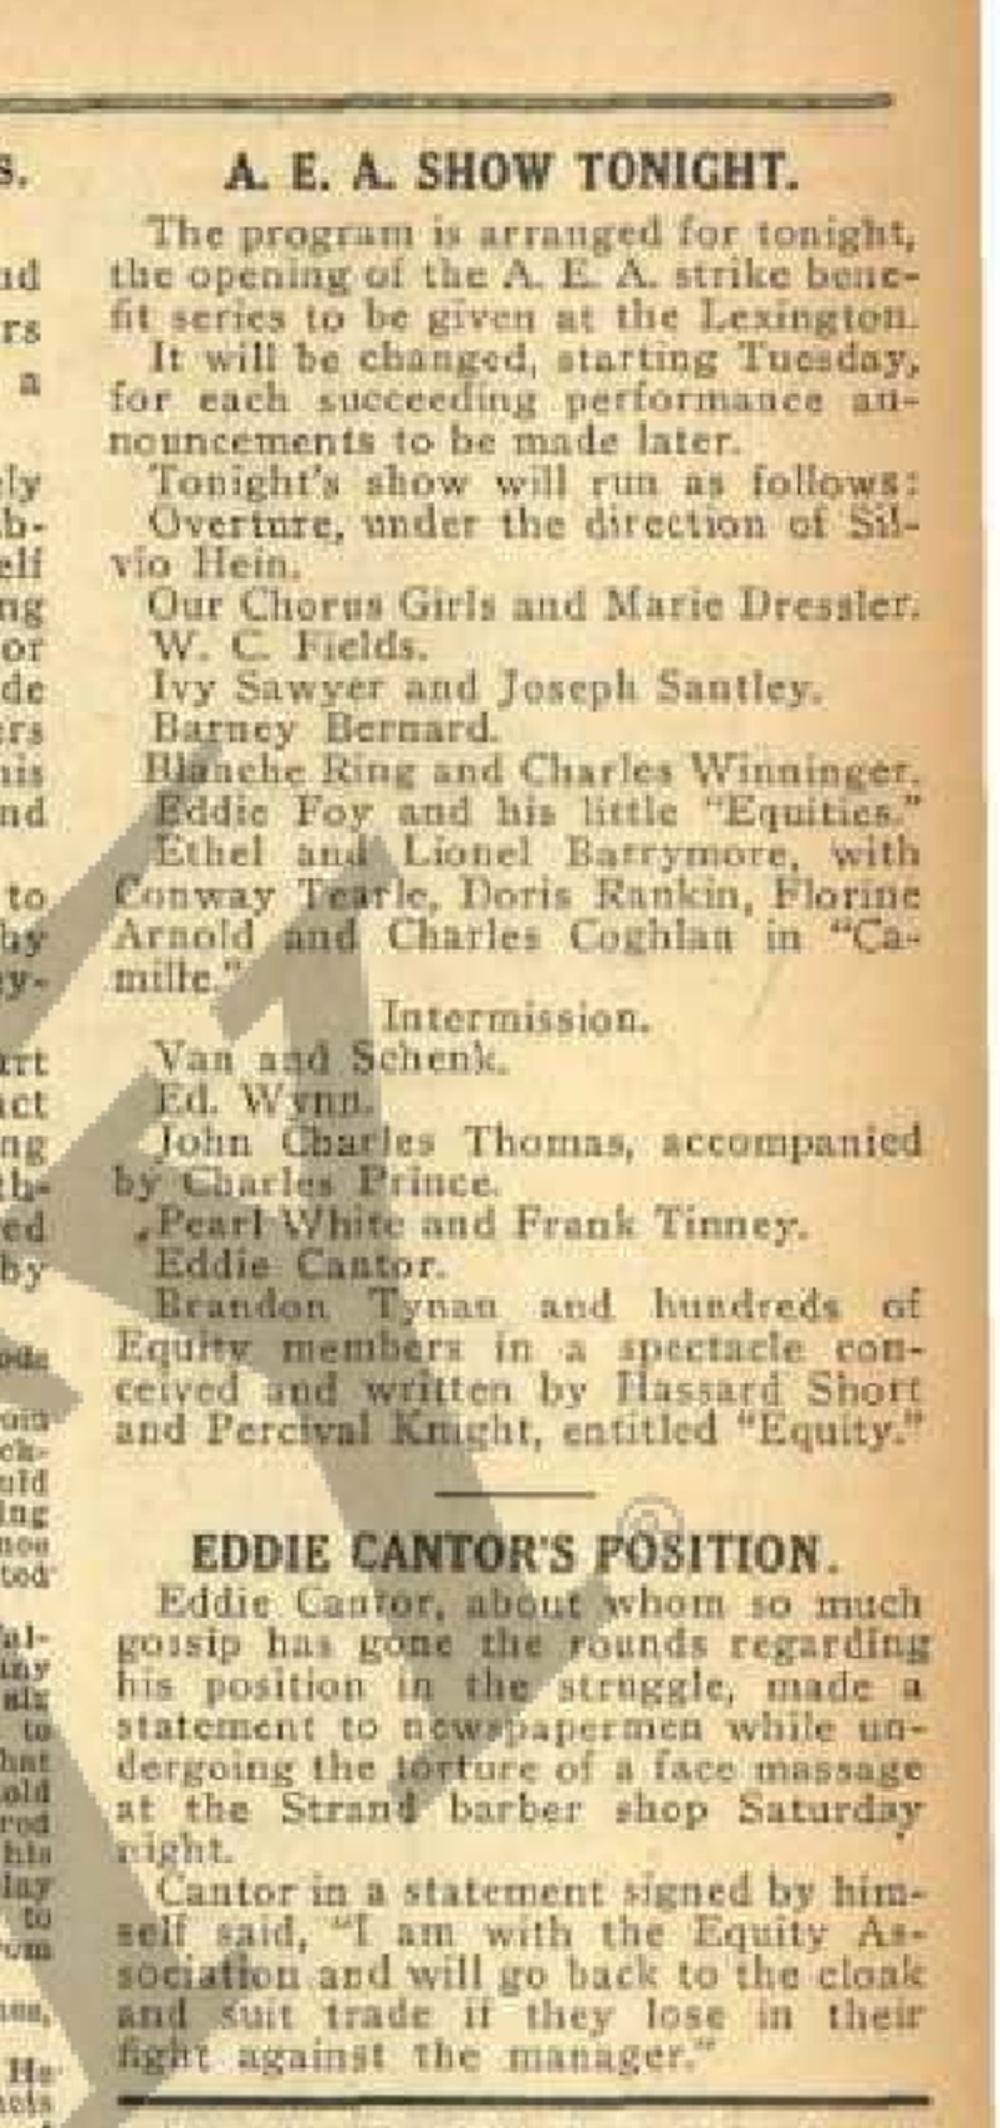 """Eddie Cantor's Position"" (on AEA strike)"